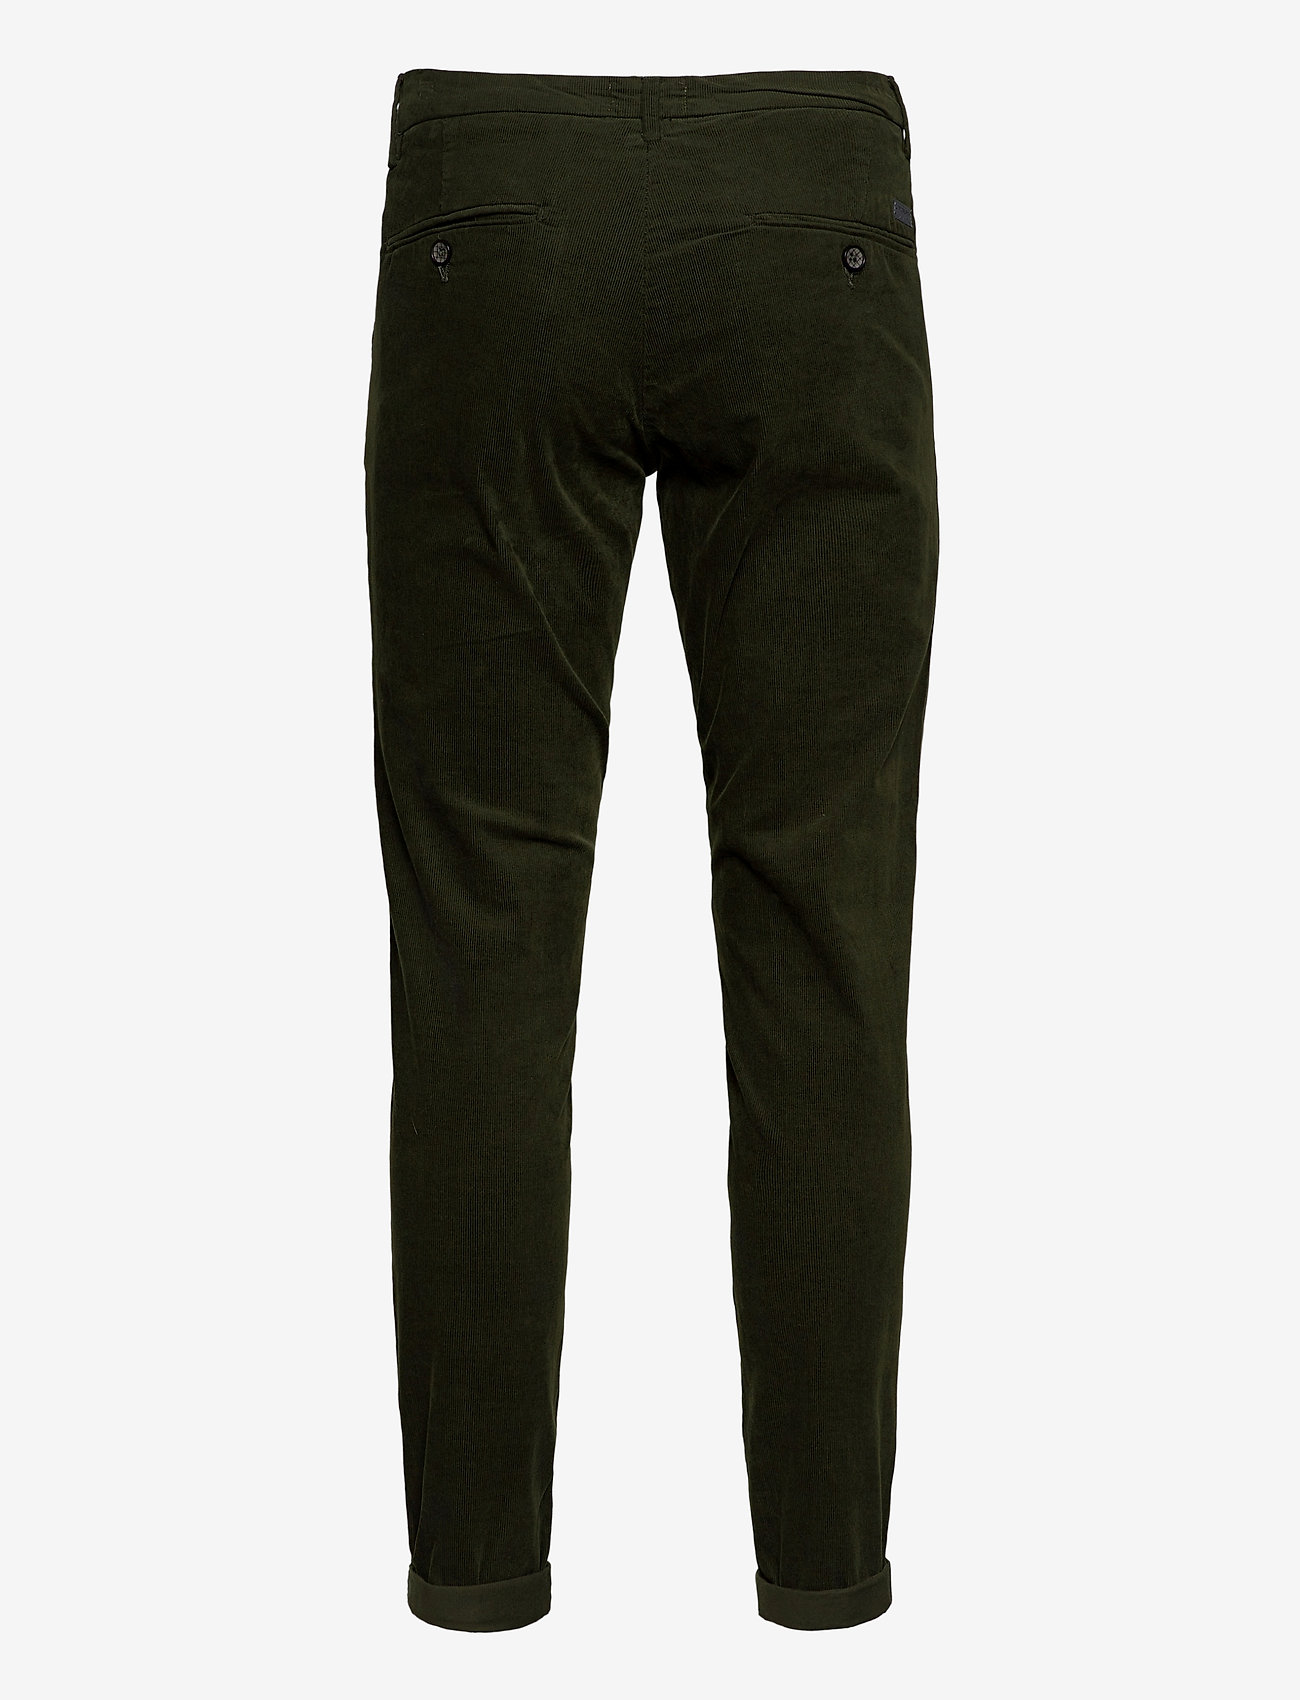 Lindbergh - Corduroy slim fit pants - rennot - army - 1